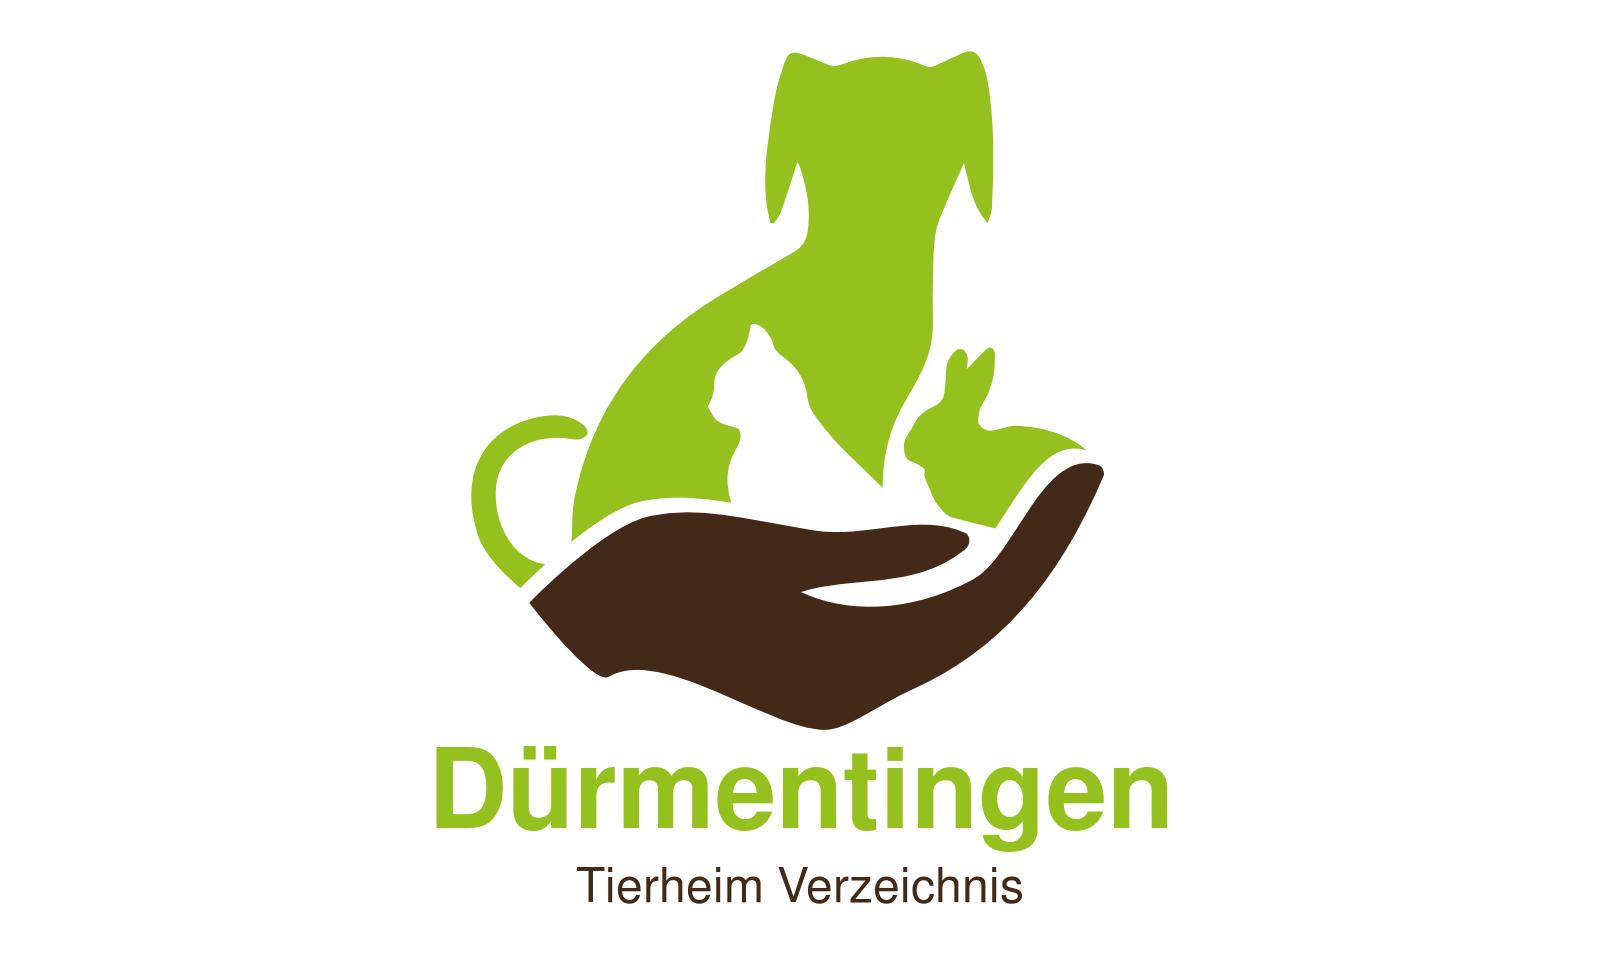 Tierheim Dürmentingen